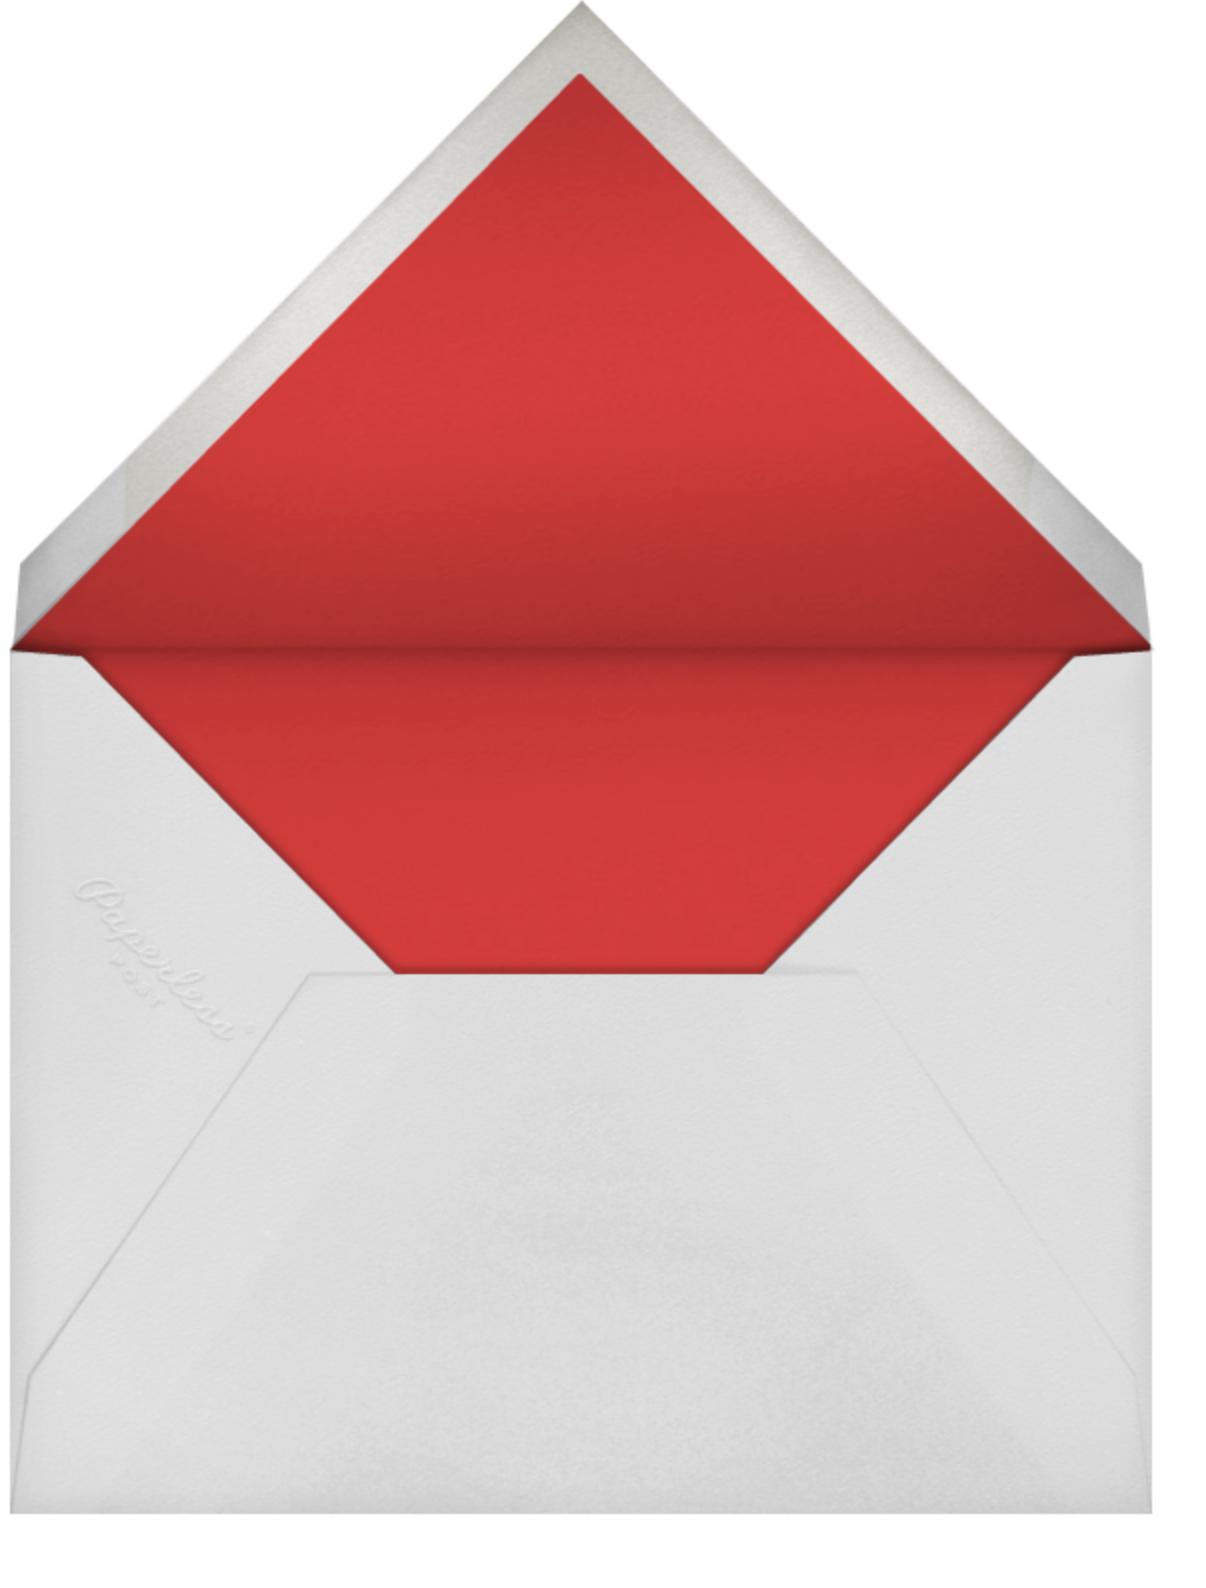 Radiant Swirls (Square) - Oscar de la Renta - New Year's Eve - envelope back